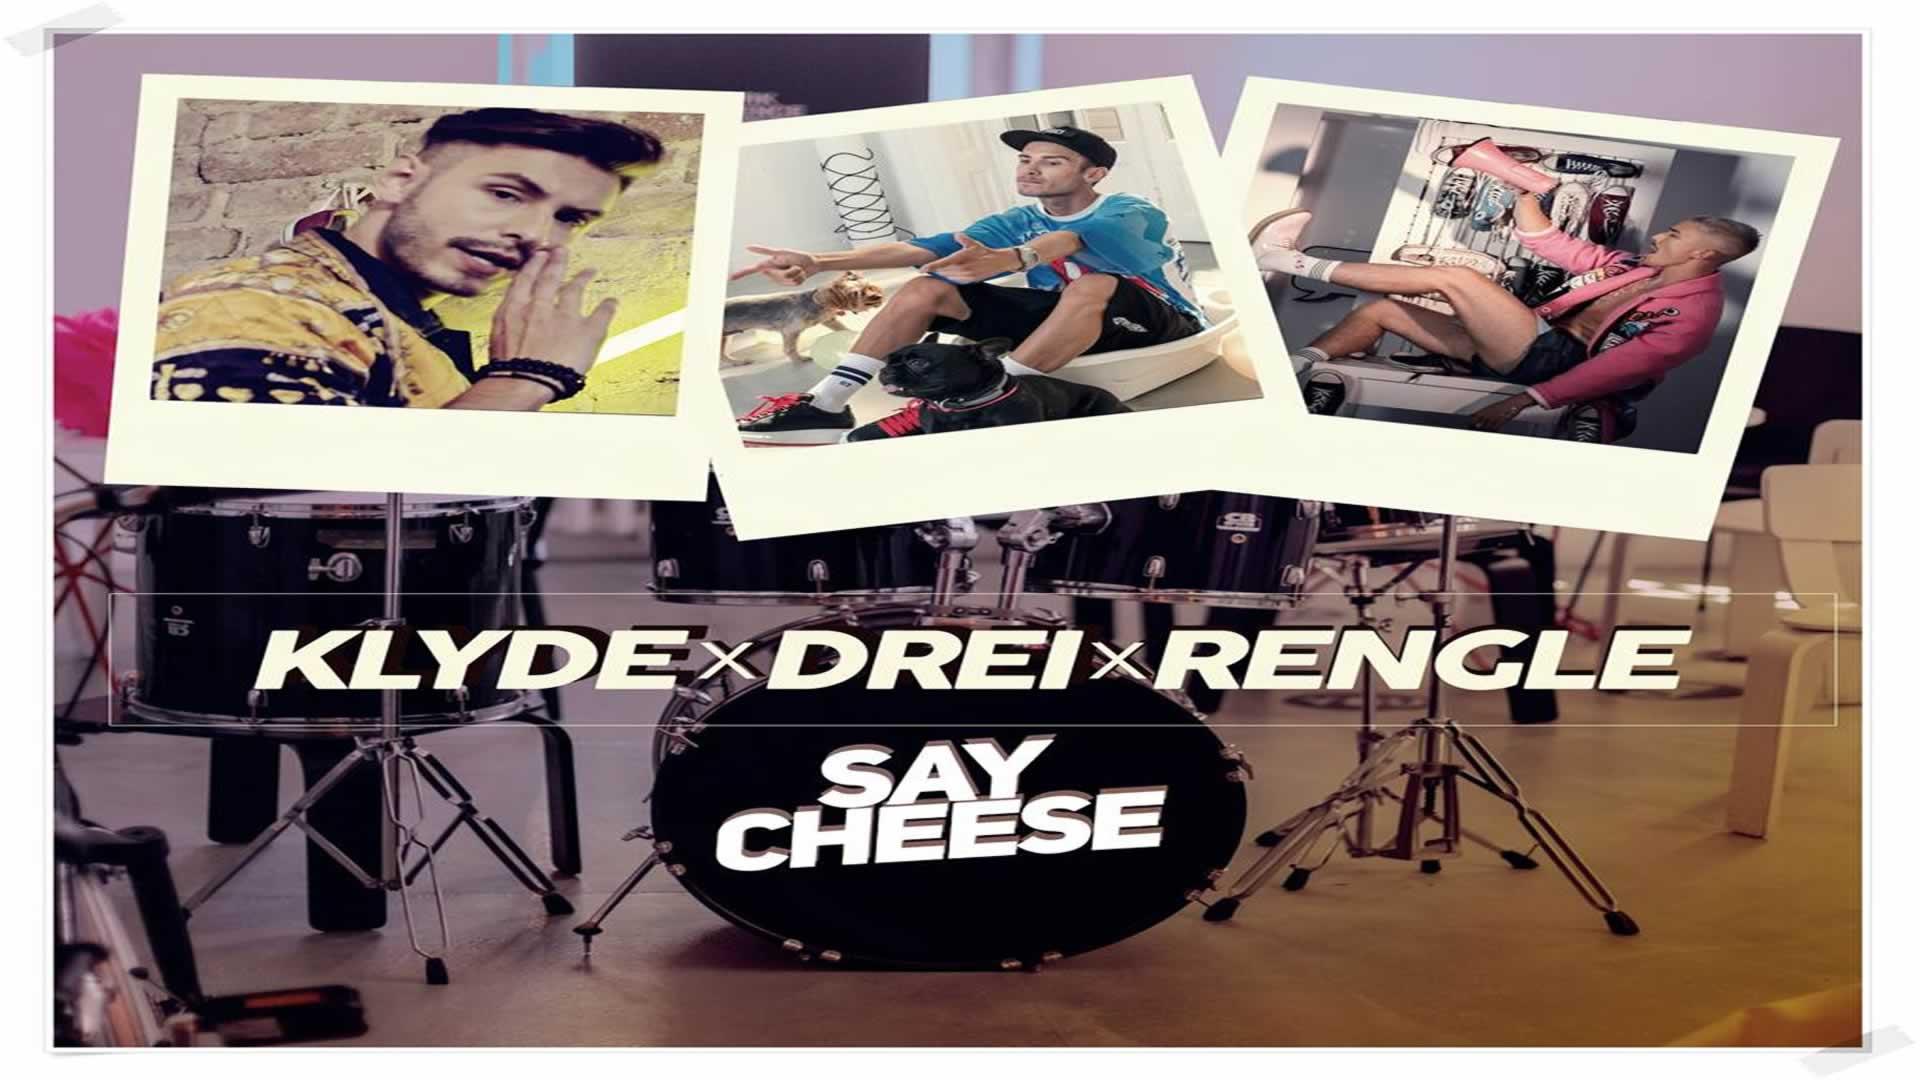 Klyde x Drei x Rengle - Say Cheese